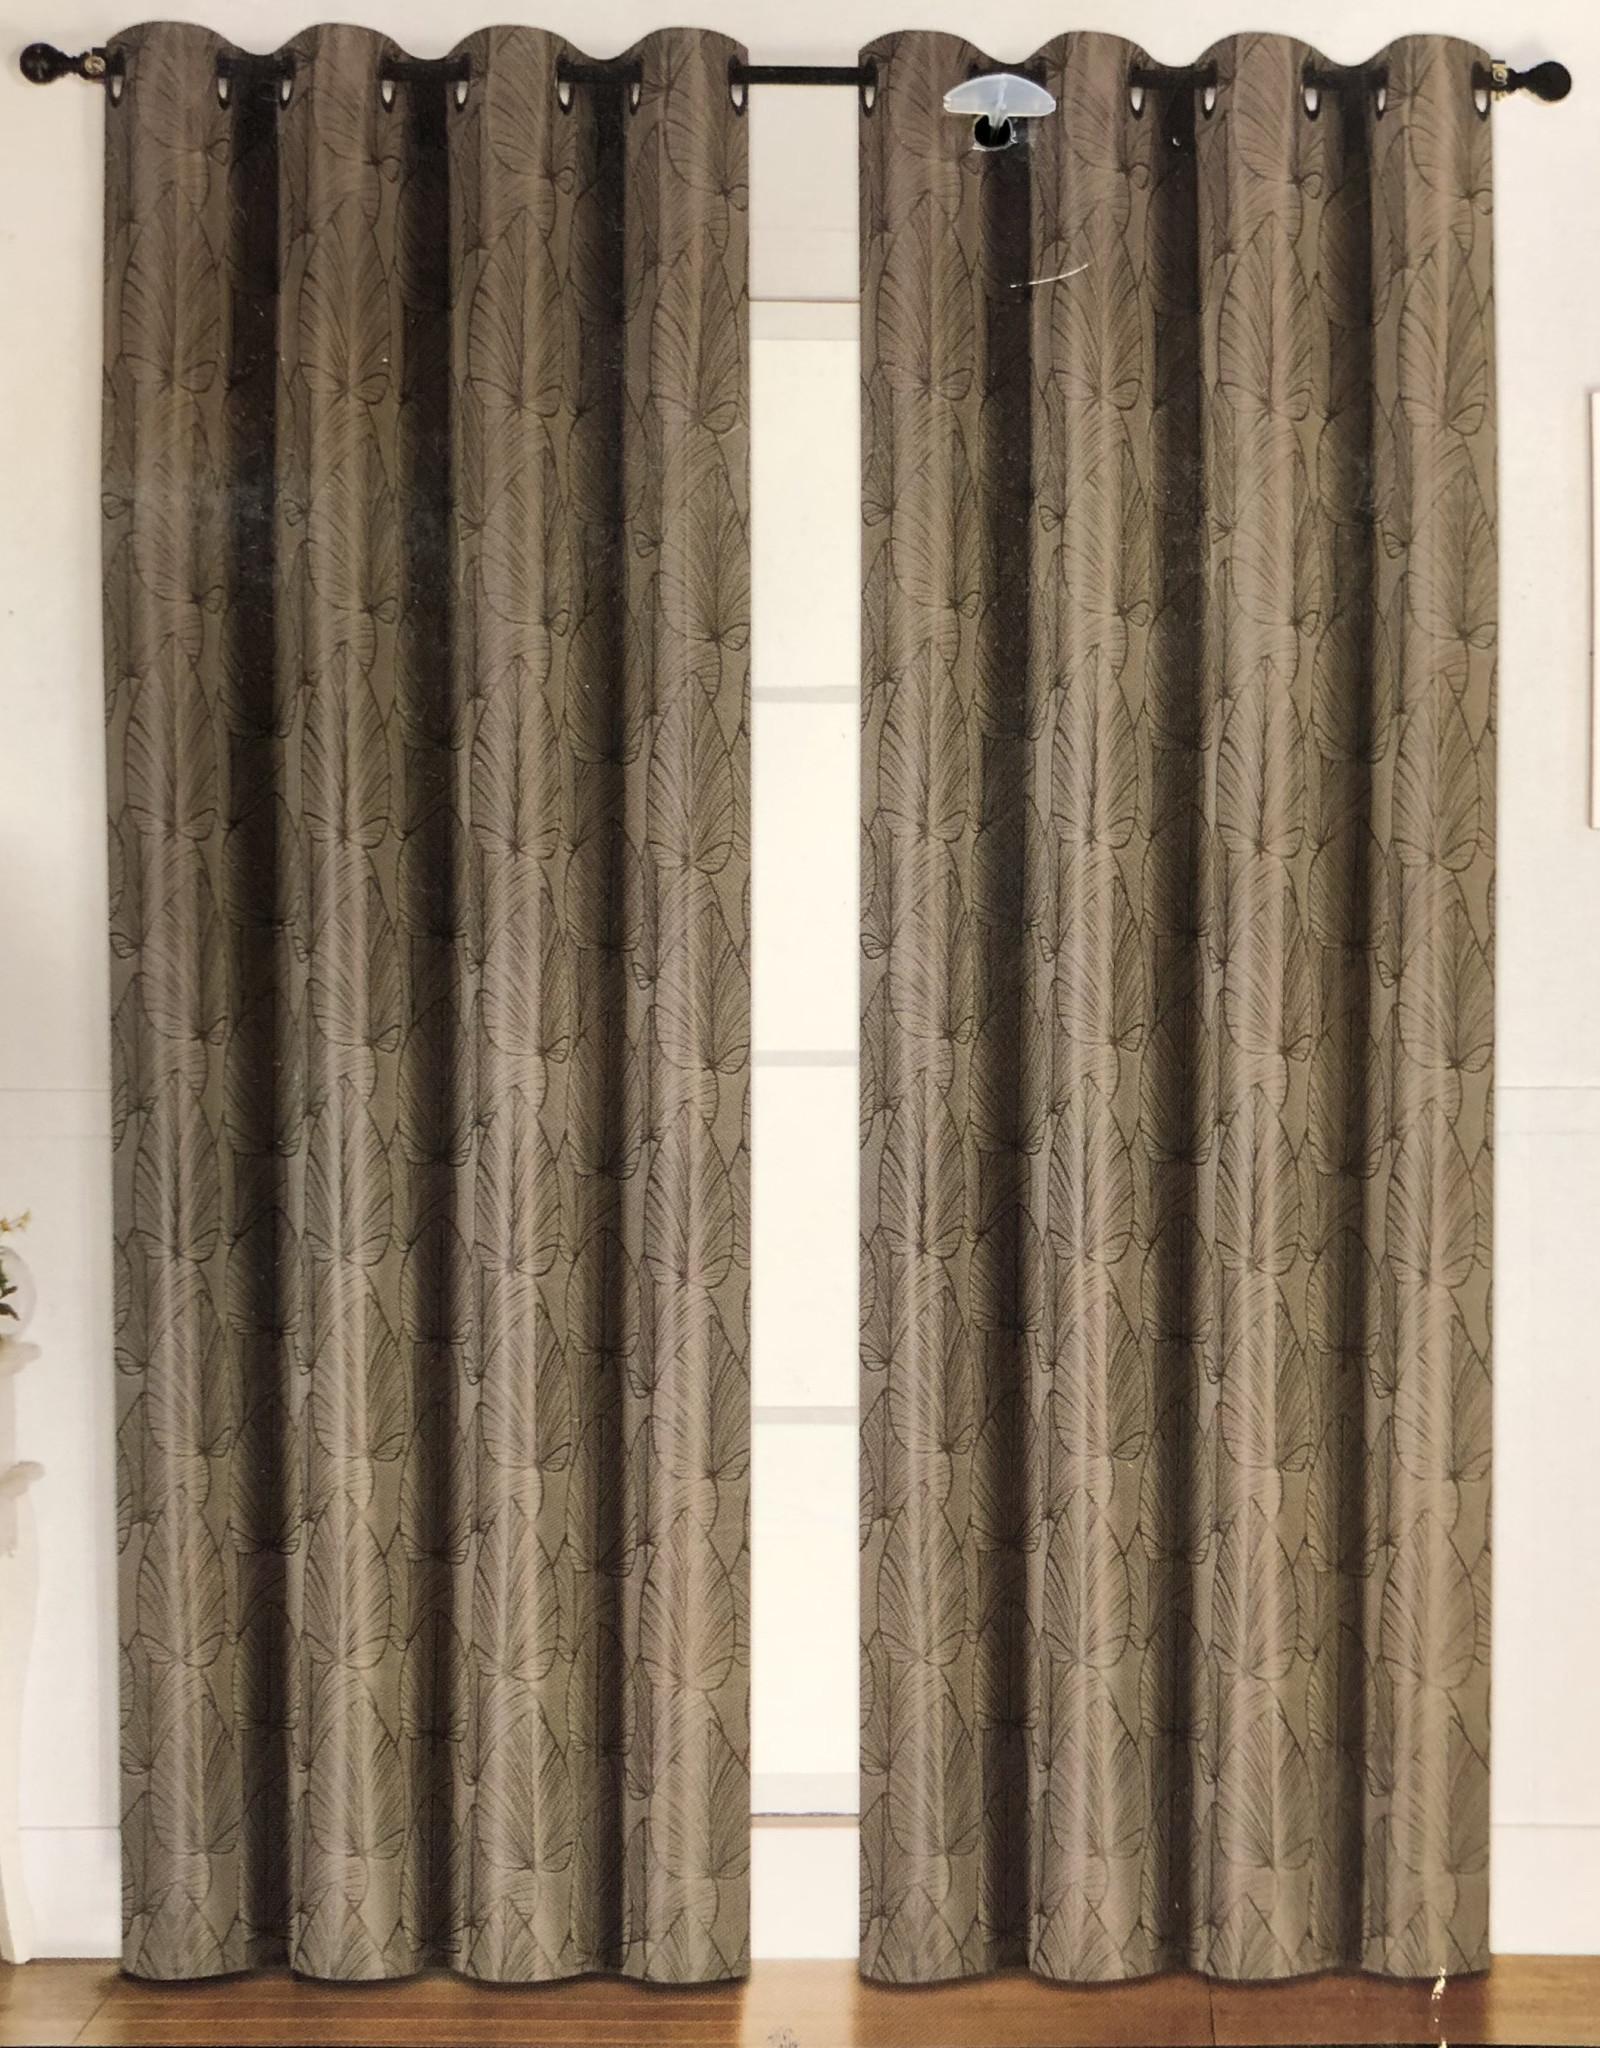 Curtains CasaDecor Green Leaf 54x84